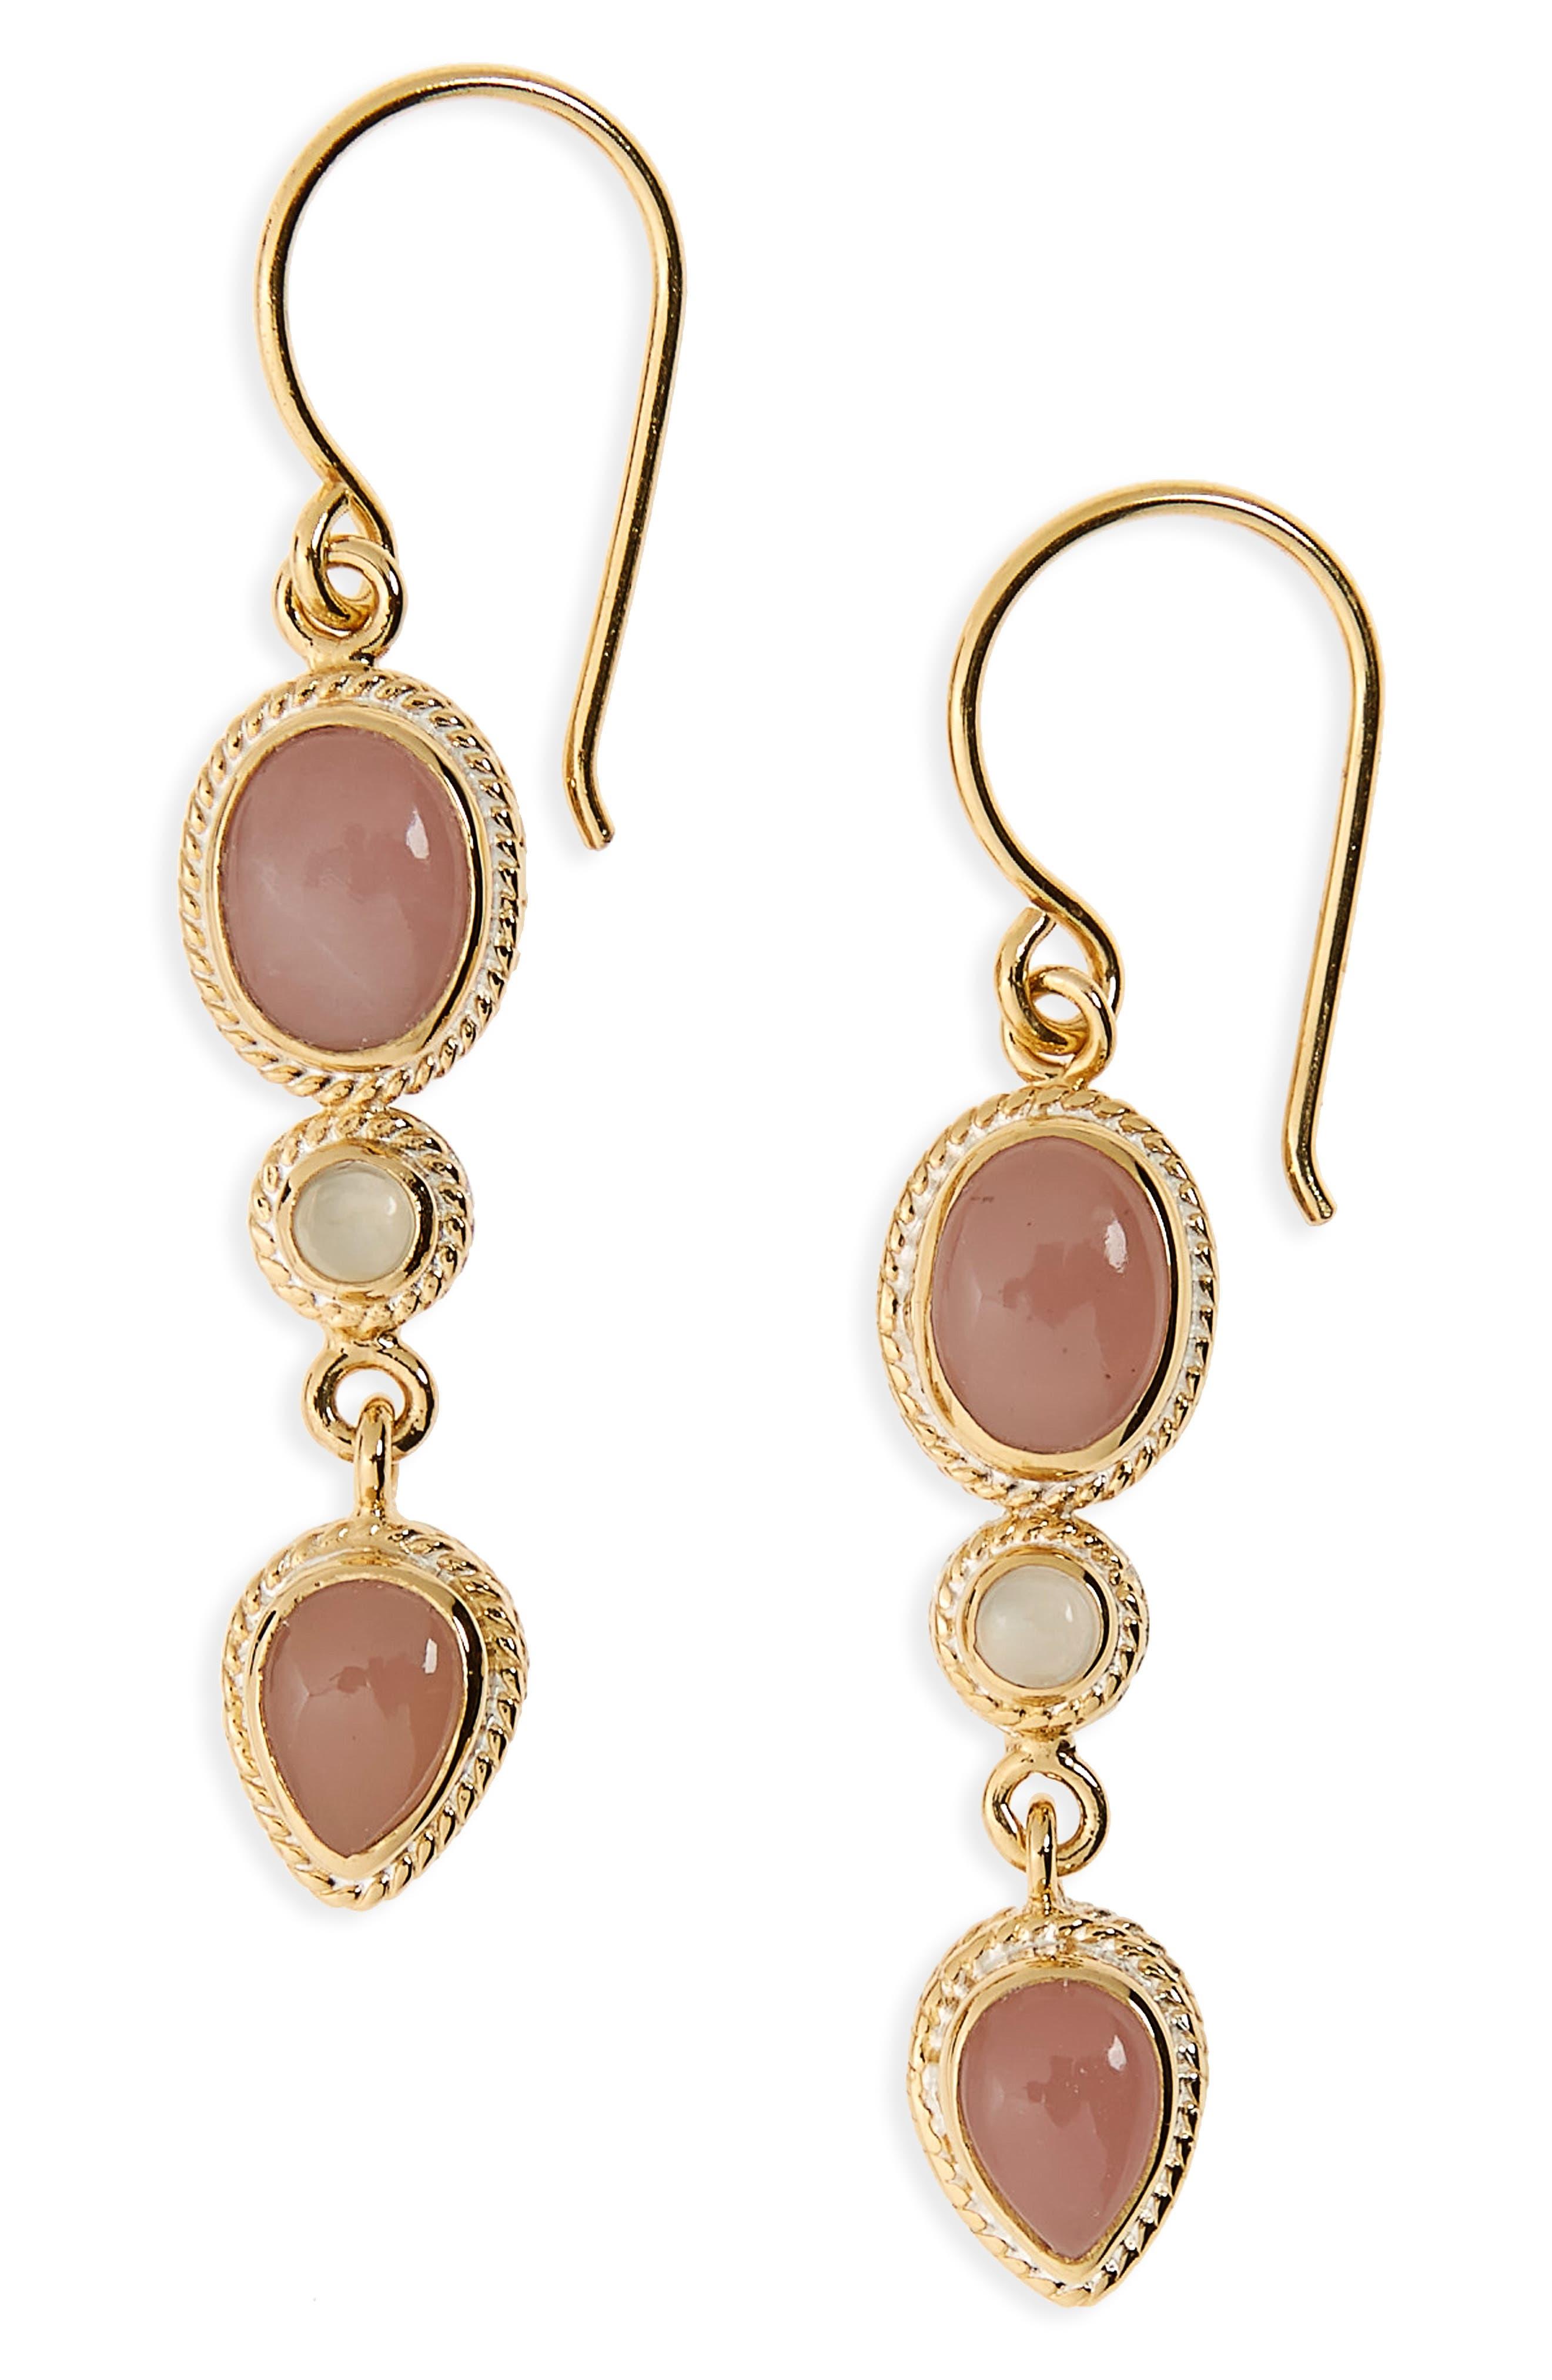 Stone Drop Earrings,                             Main thumbnail 1, color,                             Gold/ Guava Quartz/ Moonstone